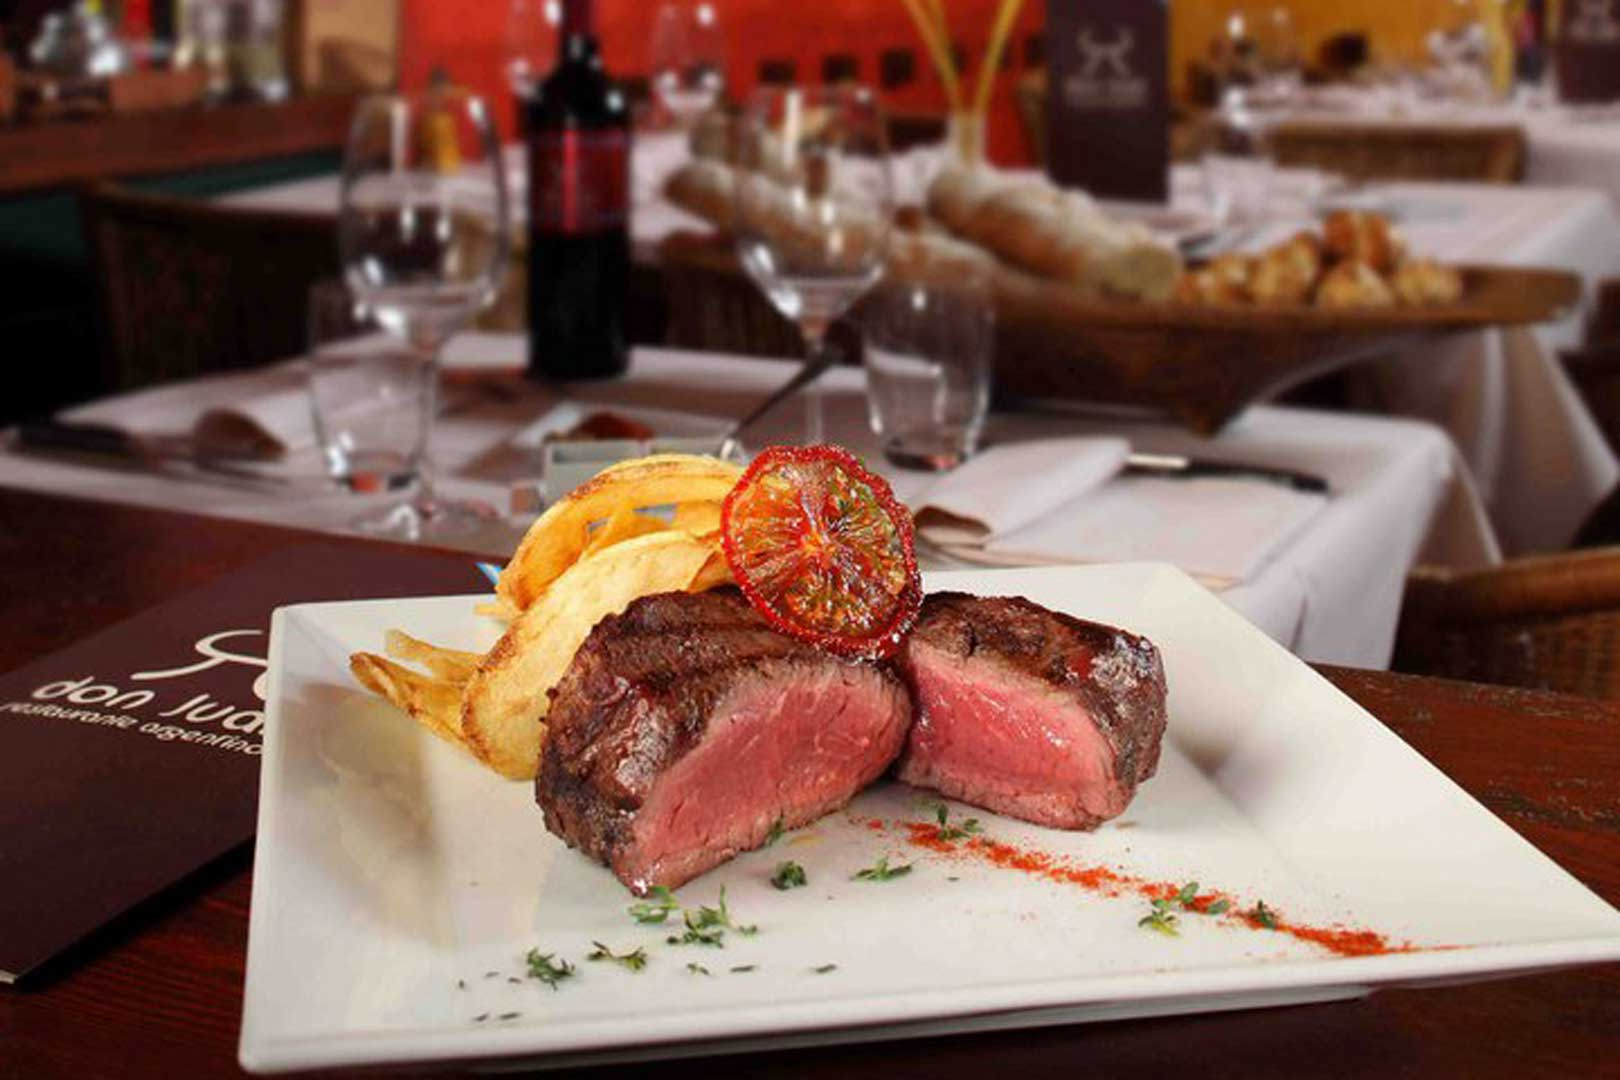 I 10 migliori ristoranti di carne a Milano - Don Juan